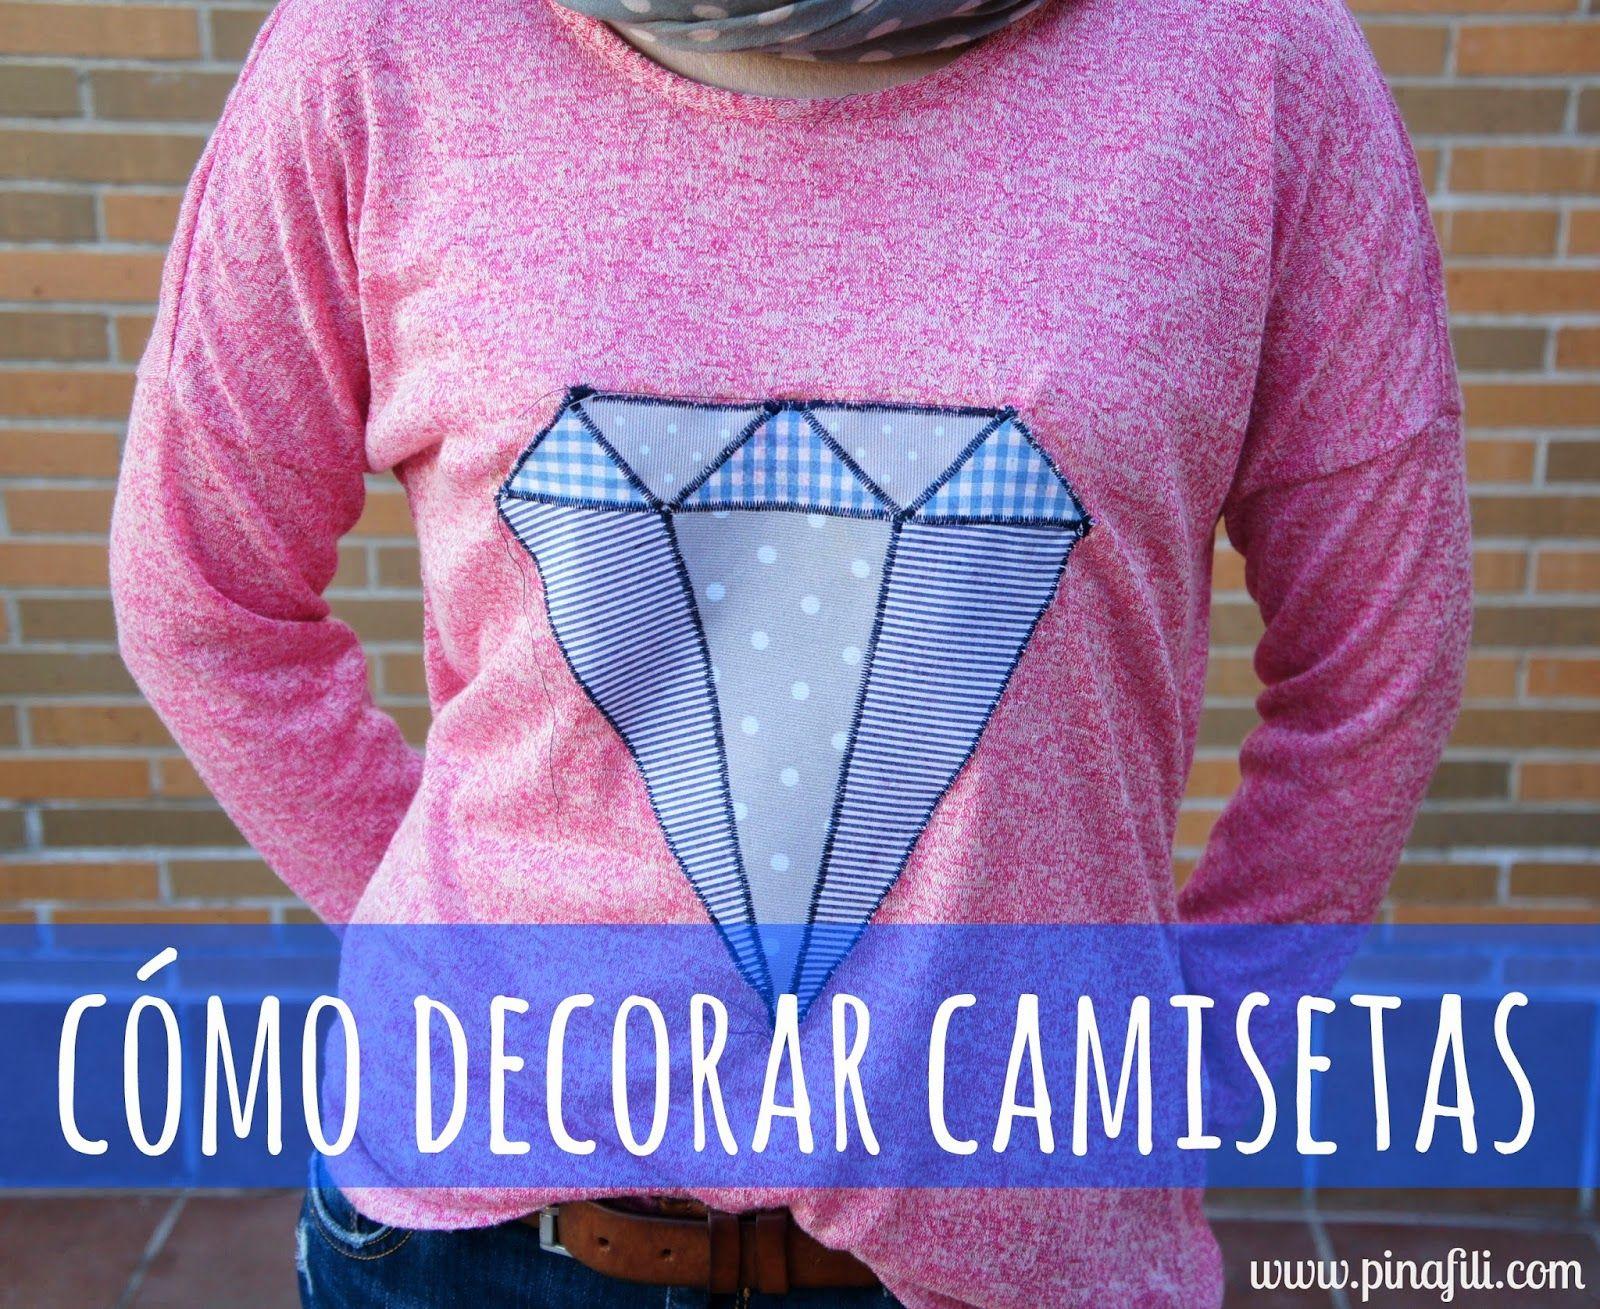 Pinafili pinafili films decorar um hoodie sudaderas - Decorar camisetas basicas ...